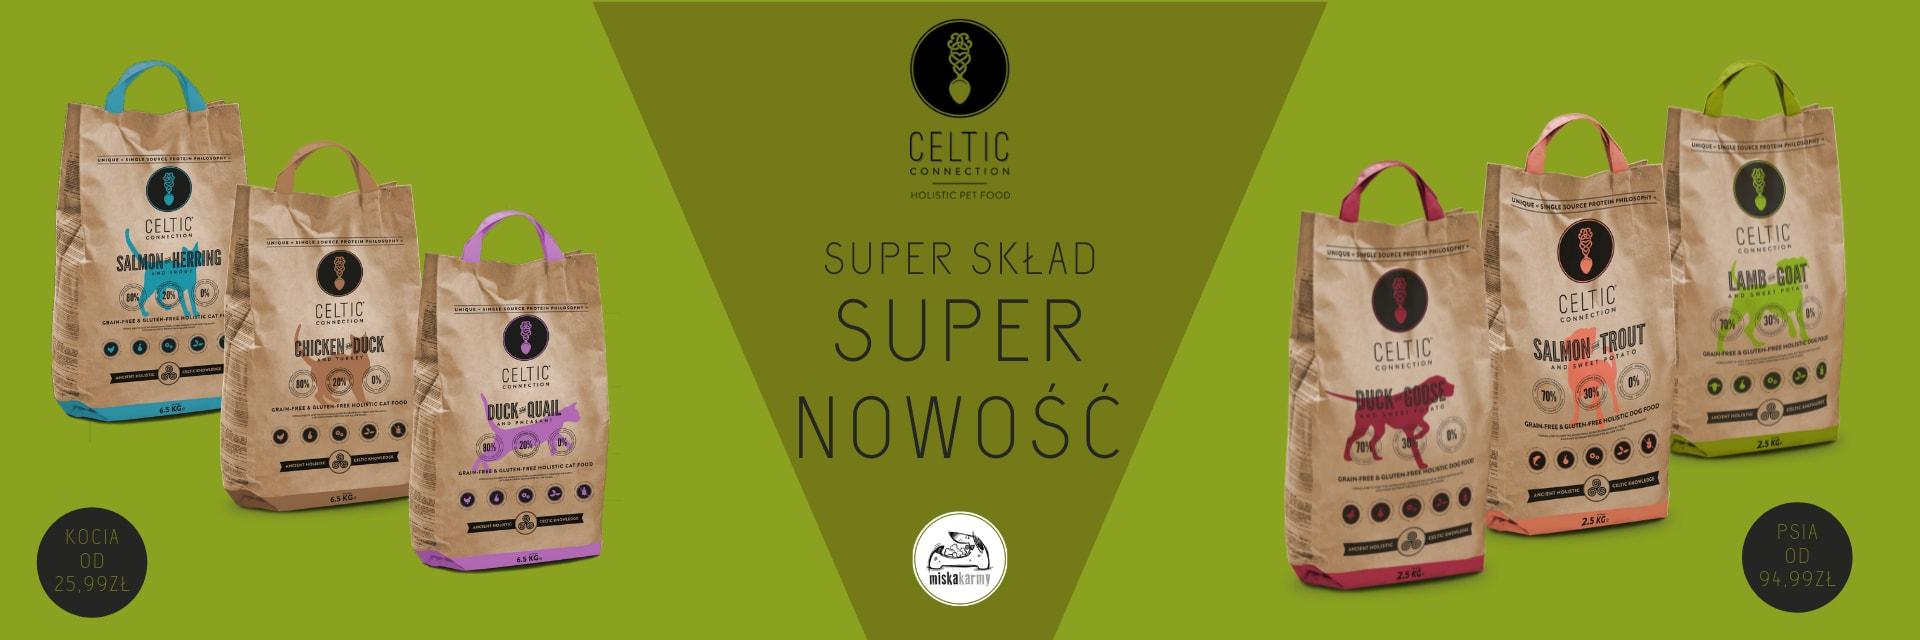 Celtic - Super Skład - Super Nowość